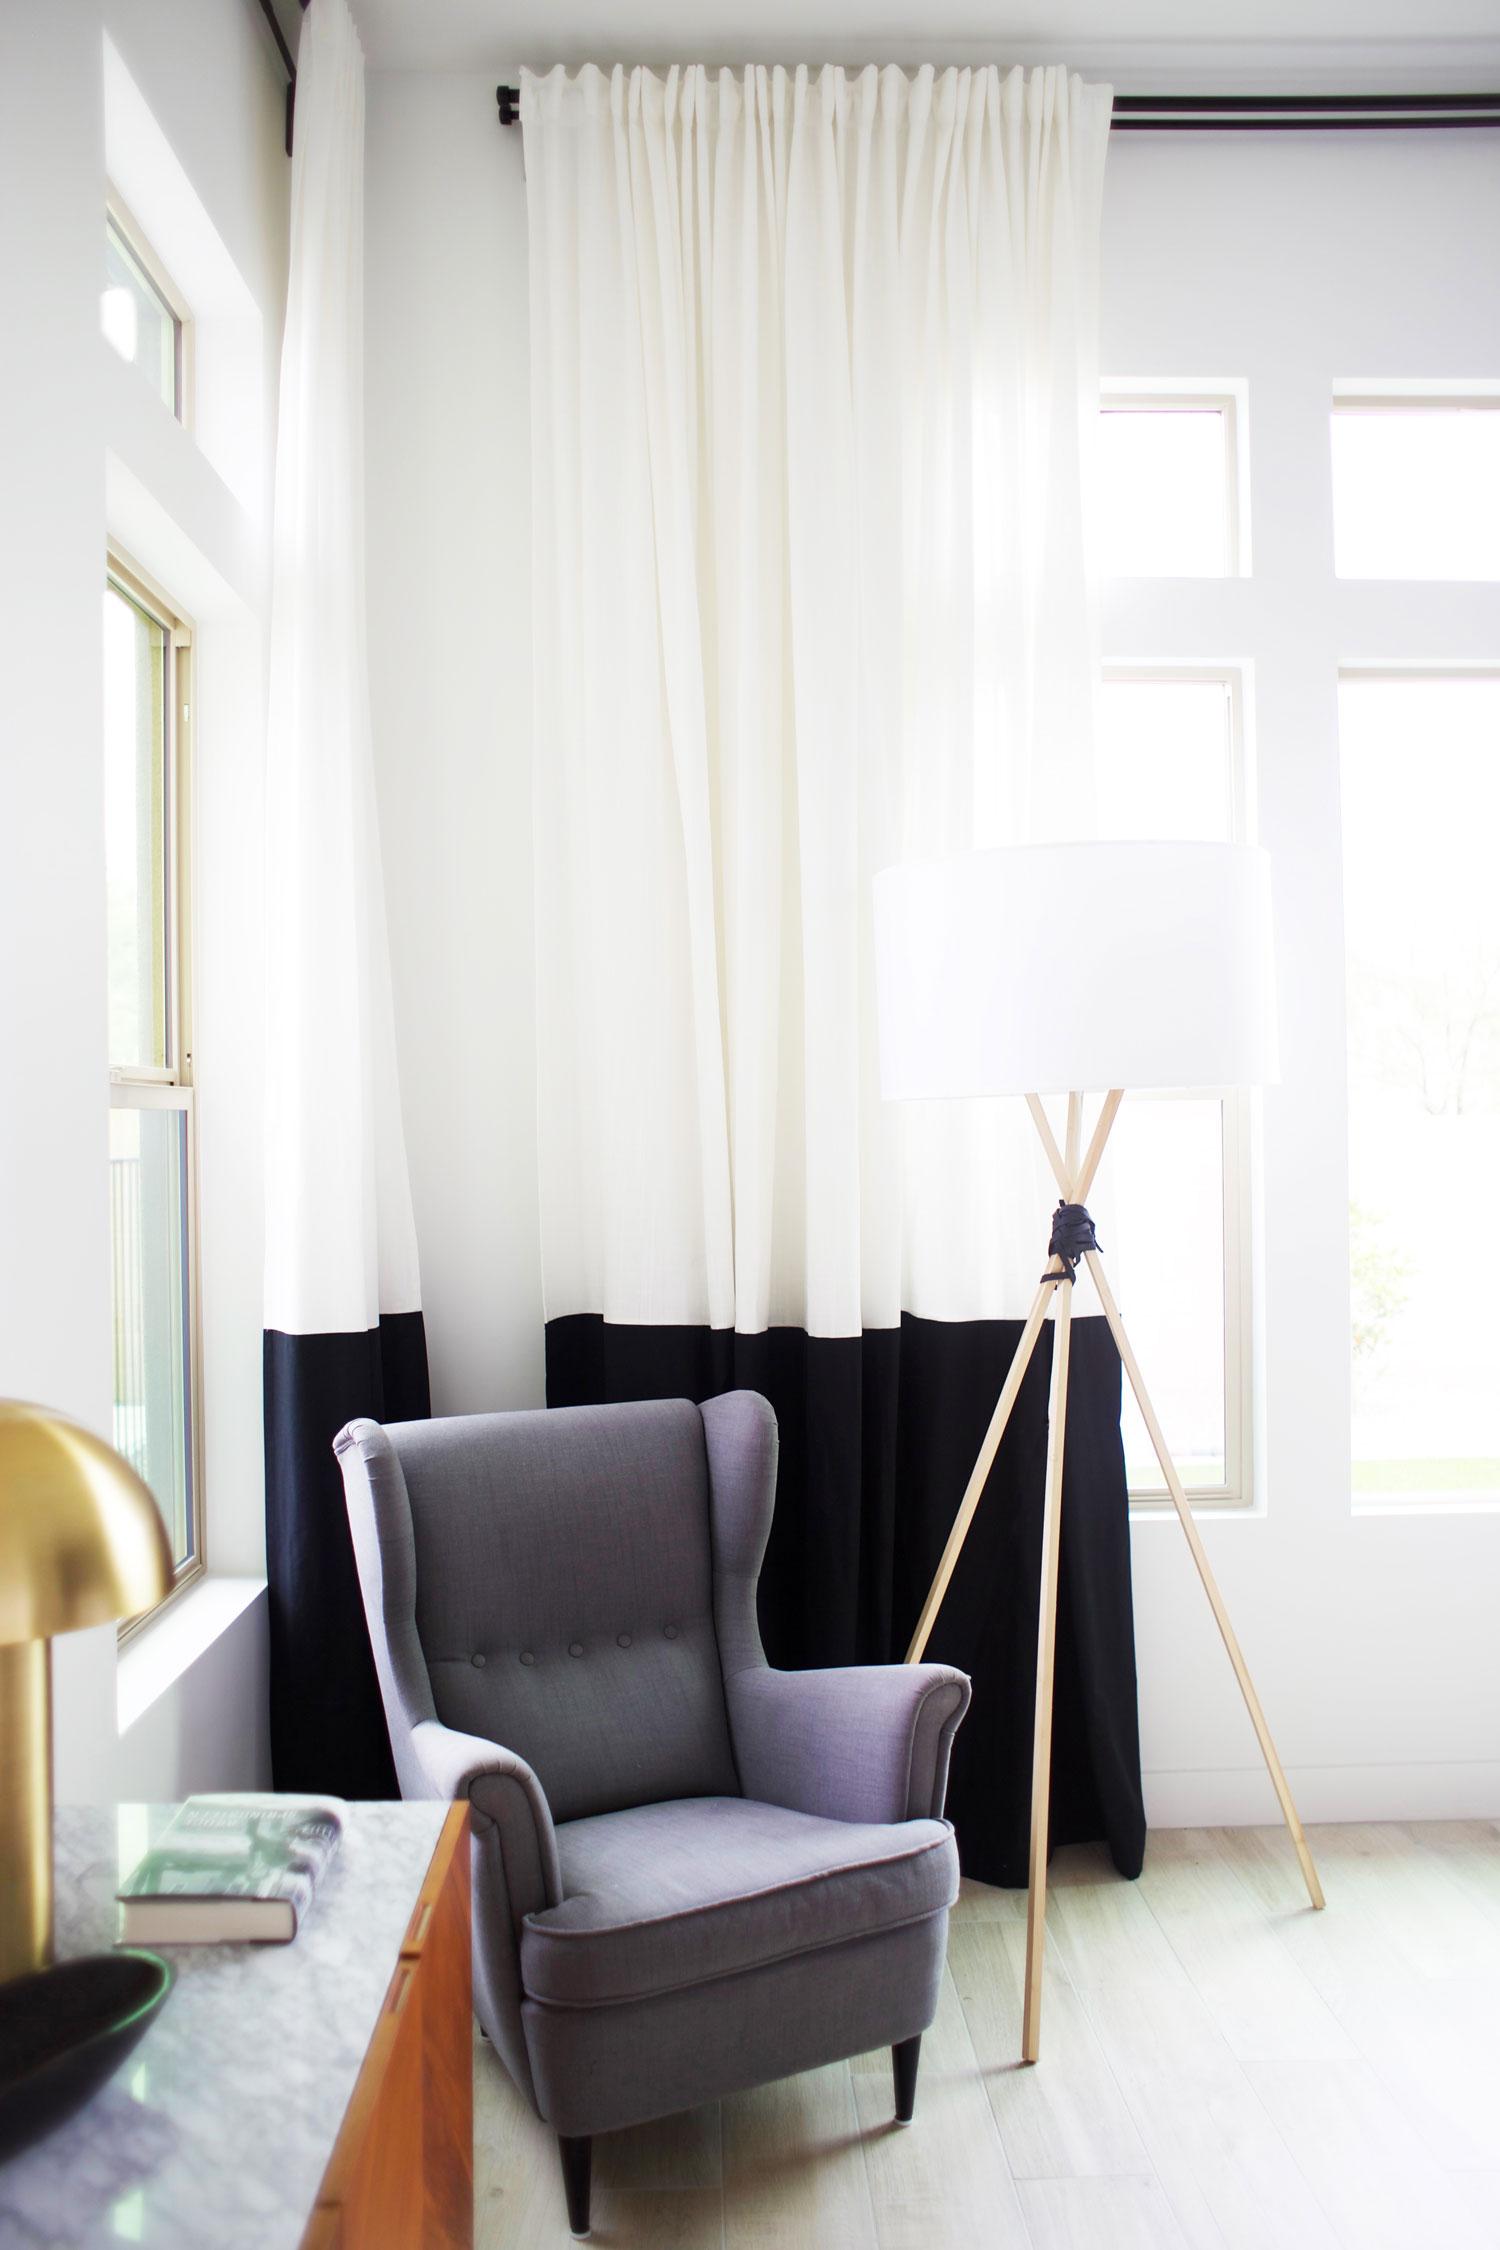 Ikea Living Room Curtains No Sew Ikea Hack Curtains Kristi Murphy Do It Yourself Blog